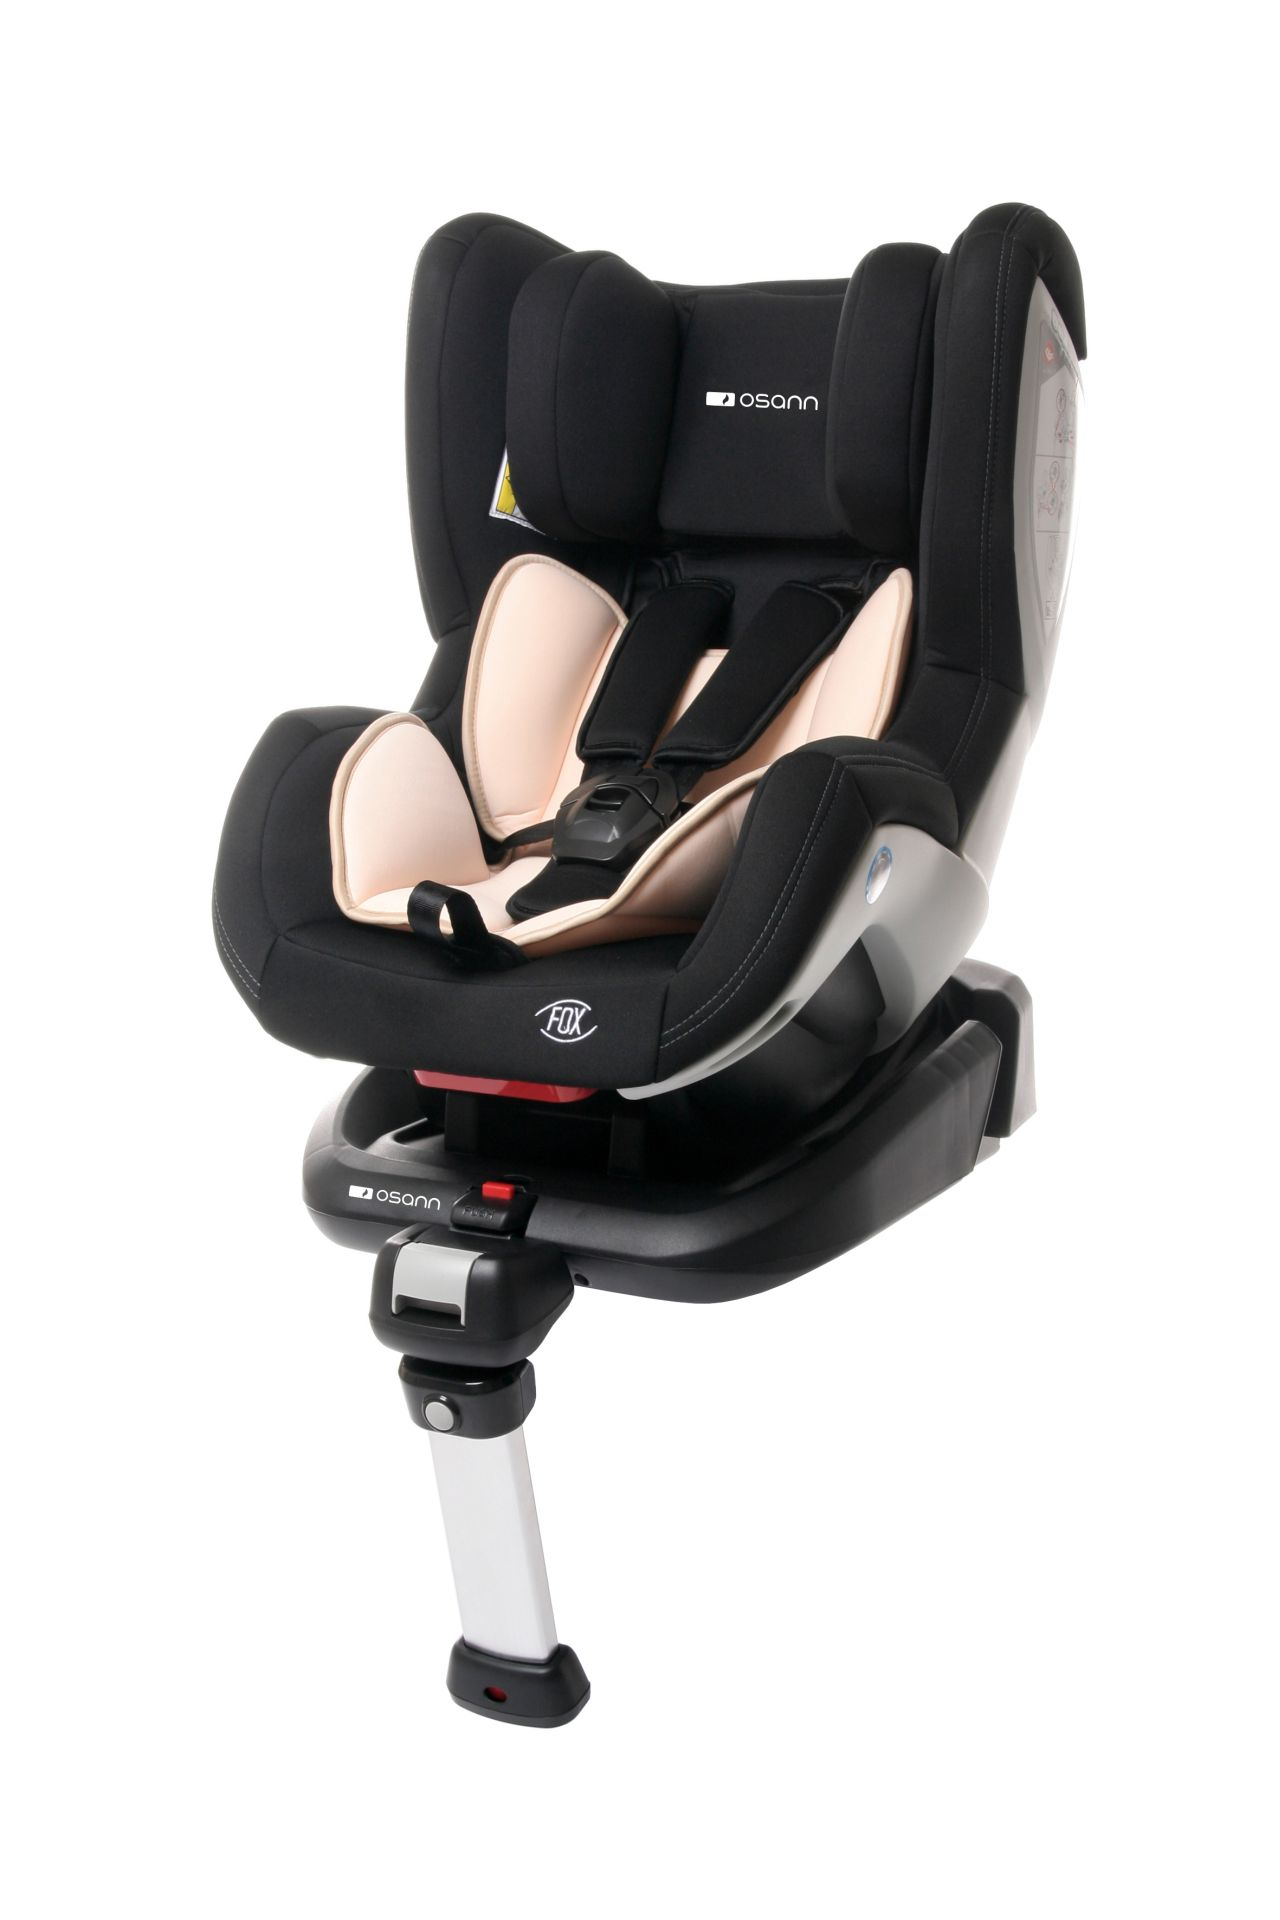 Osann Reboarder-Kindersitz Fox online kaufen bei kidsroom ...